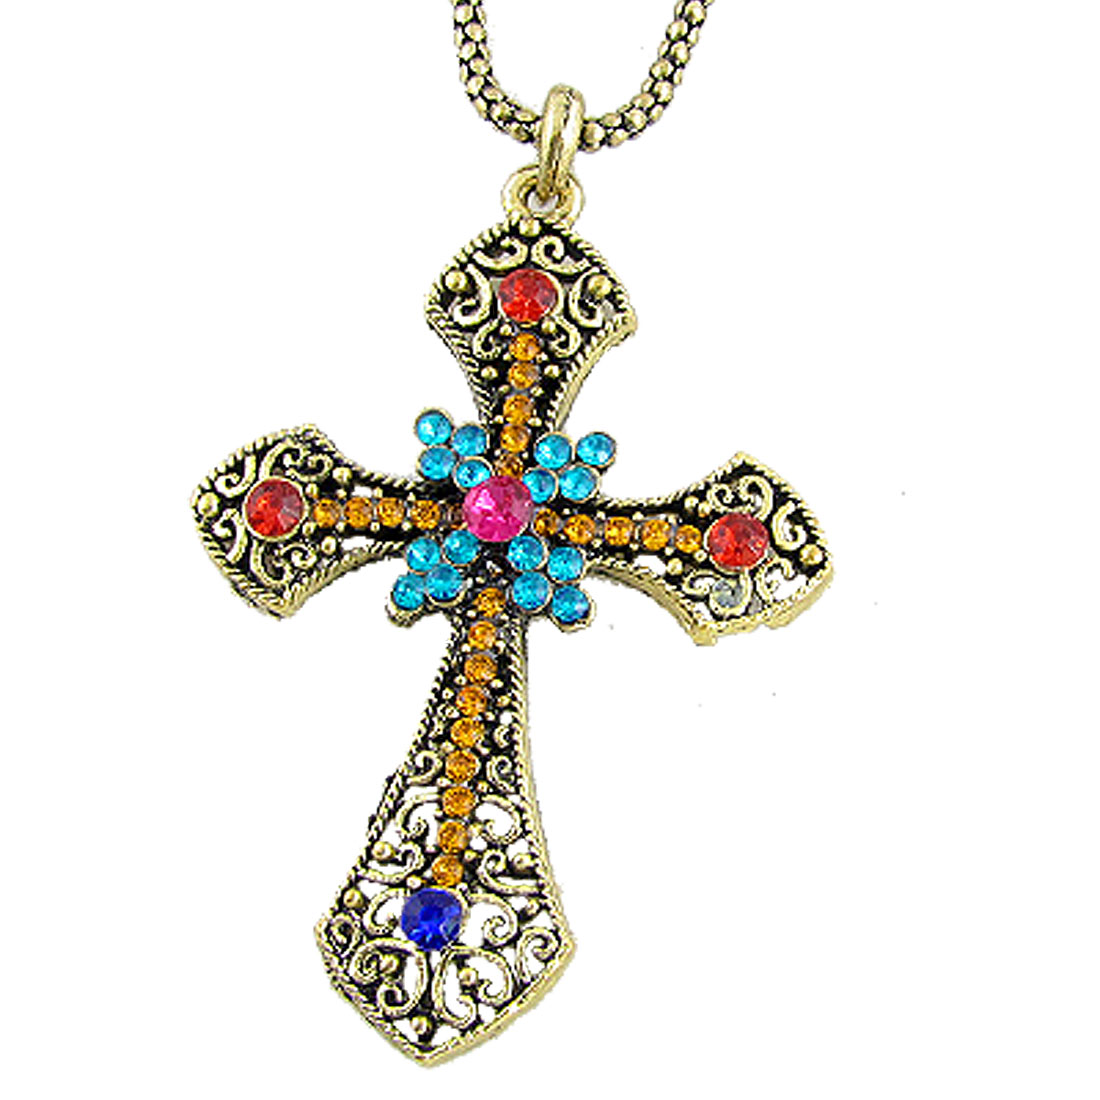 Women Rhinestone Hollow Out Cross Retro Alloy Necklace Bronze Tone